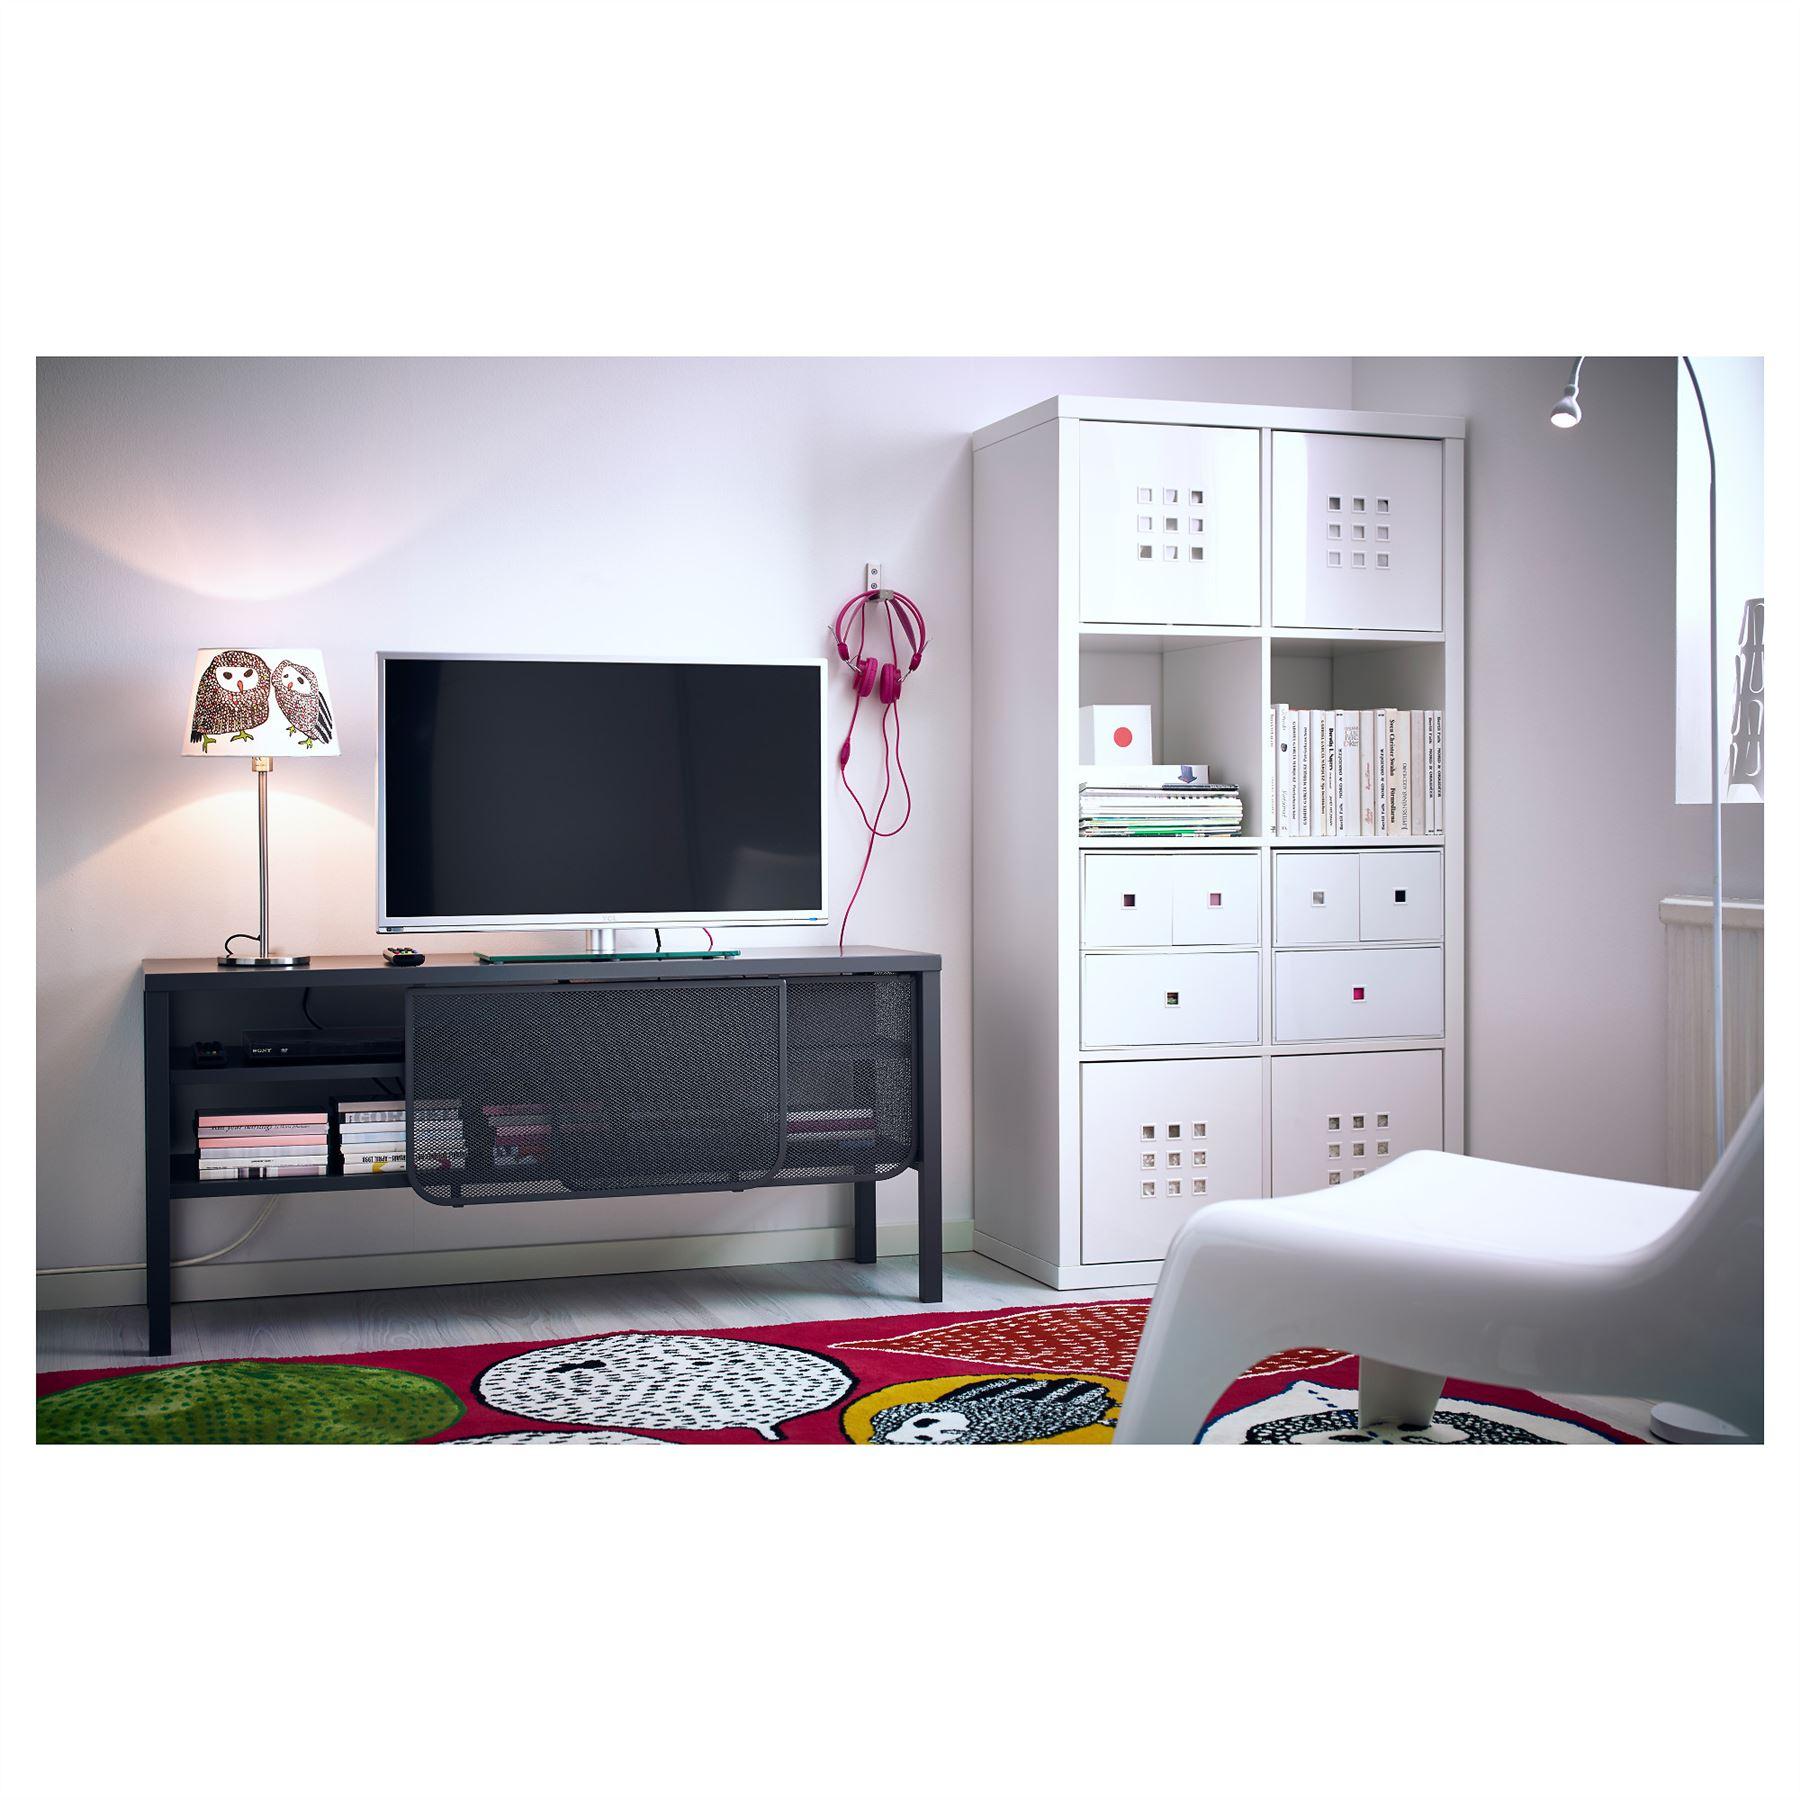 Ikea kallax 8 cube storage bookcase rectangle shelving unit various colours ebay - Kallax 8 cases ...